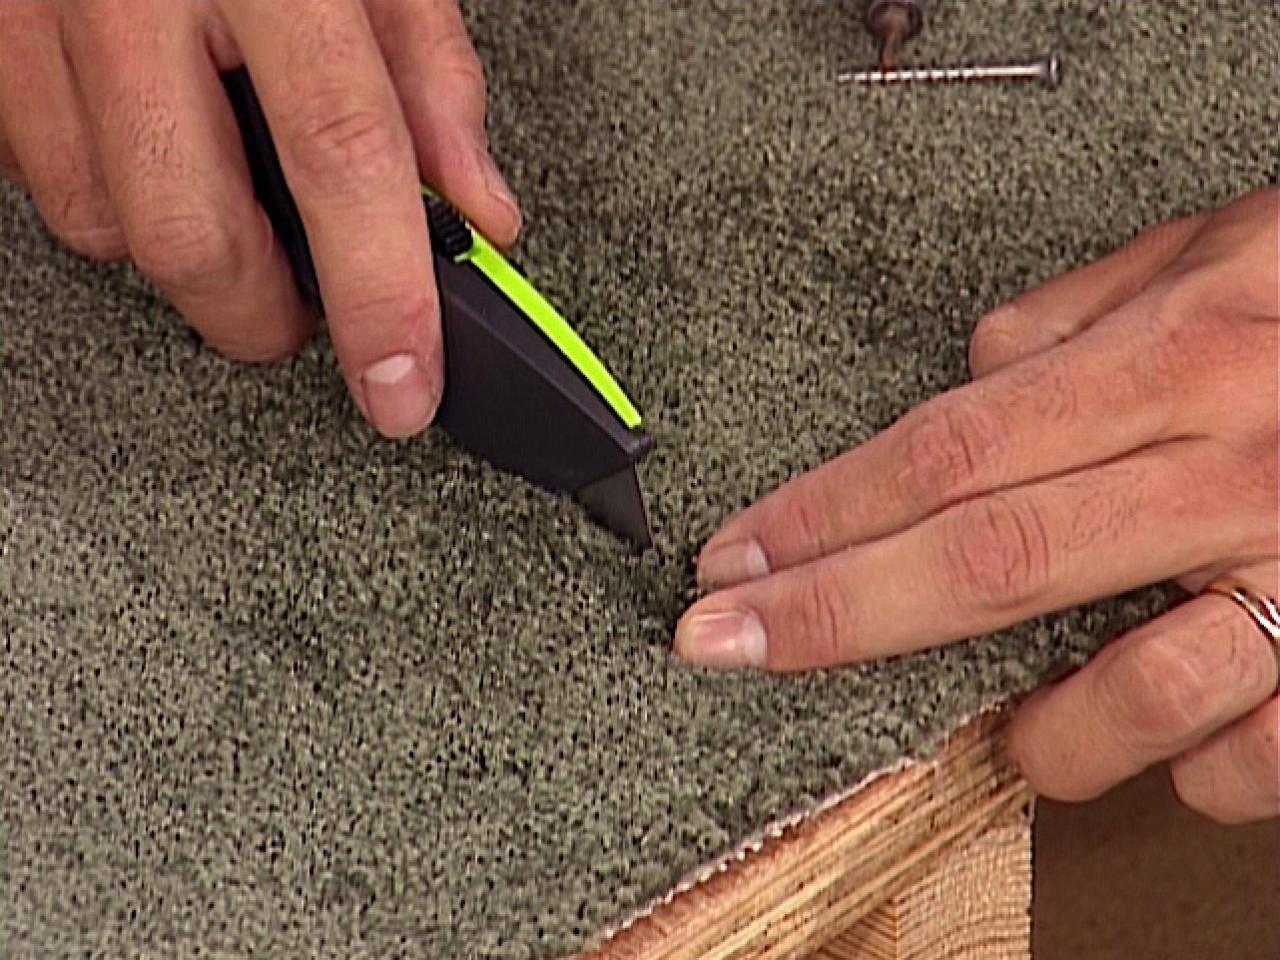 Fix Squeaky Carpeted Floors Fix Squeaky Floors Squeaky Floors Creaky Floors